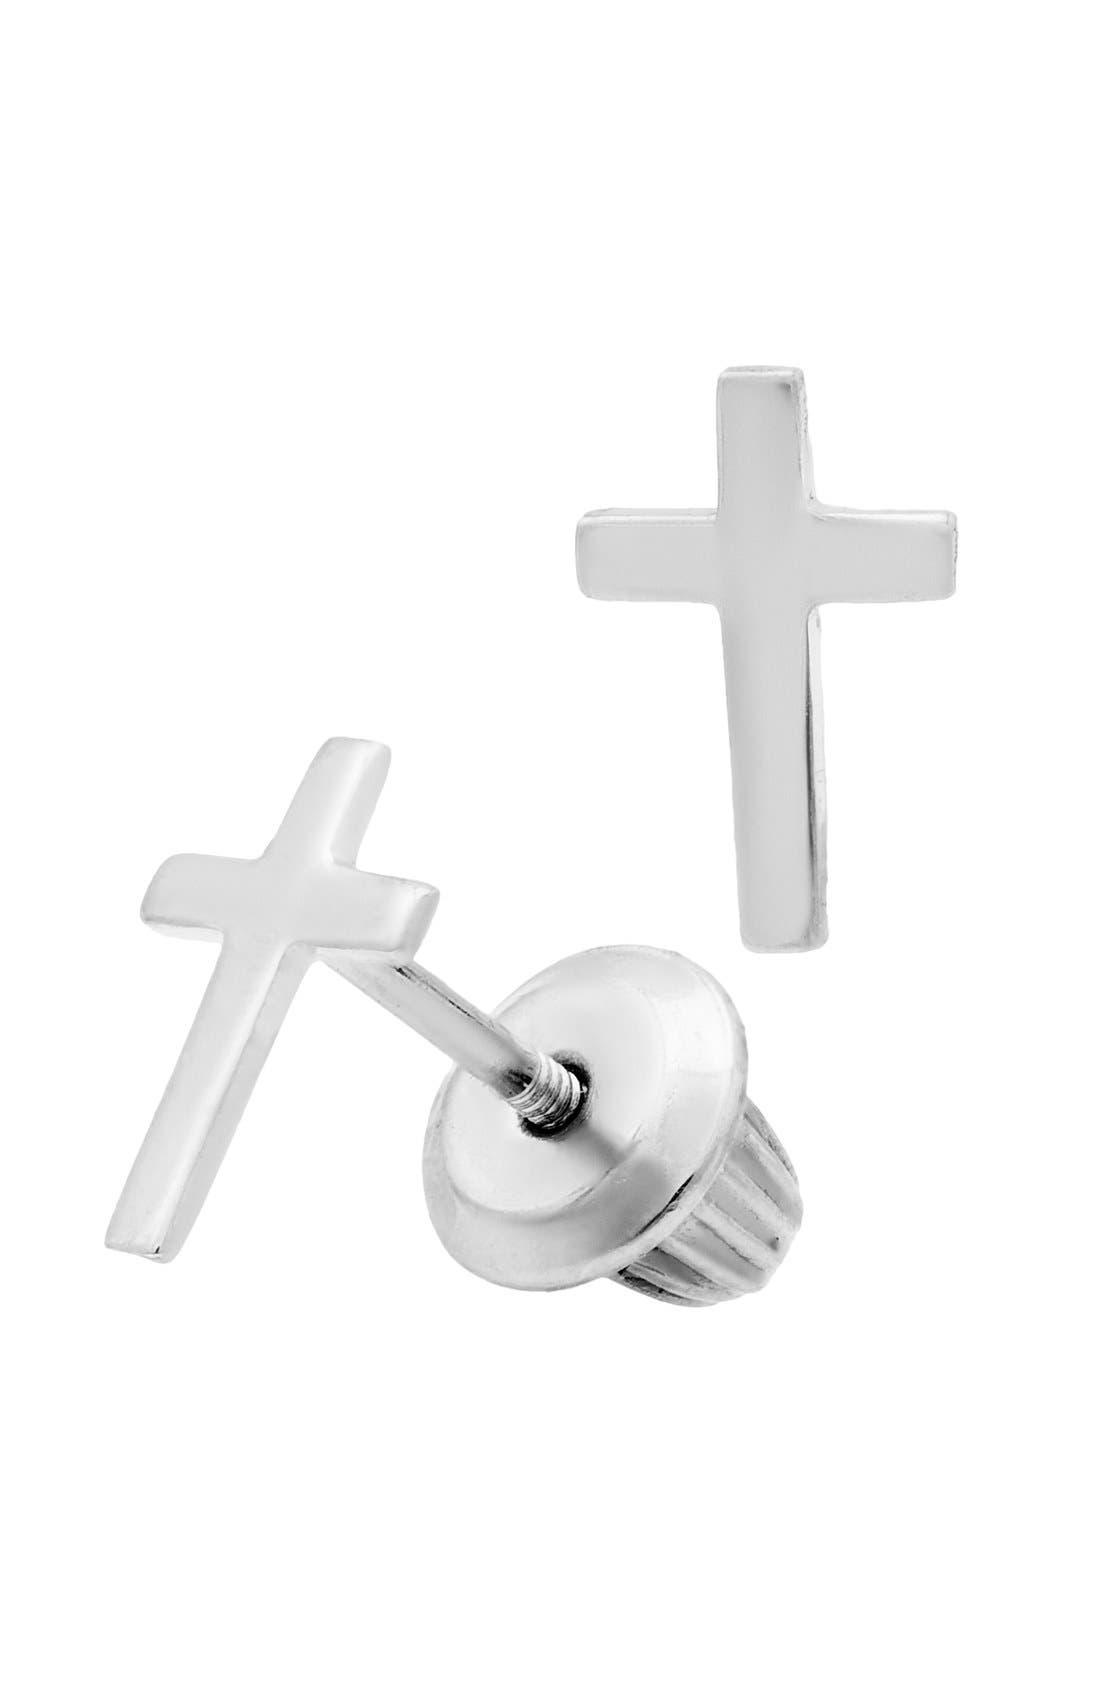 Sterling Silver Cross Earrings,                             Main thumbnail 1, color,                             040